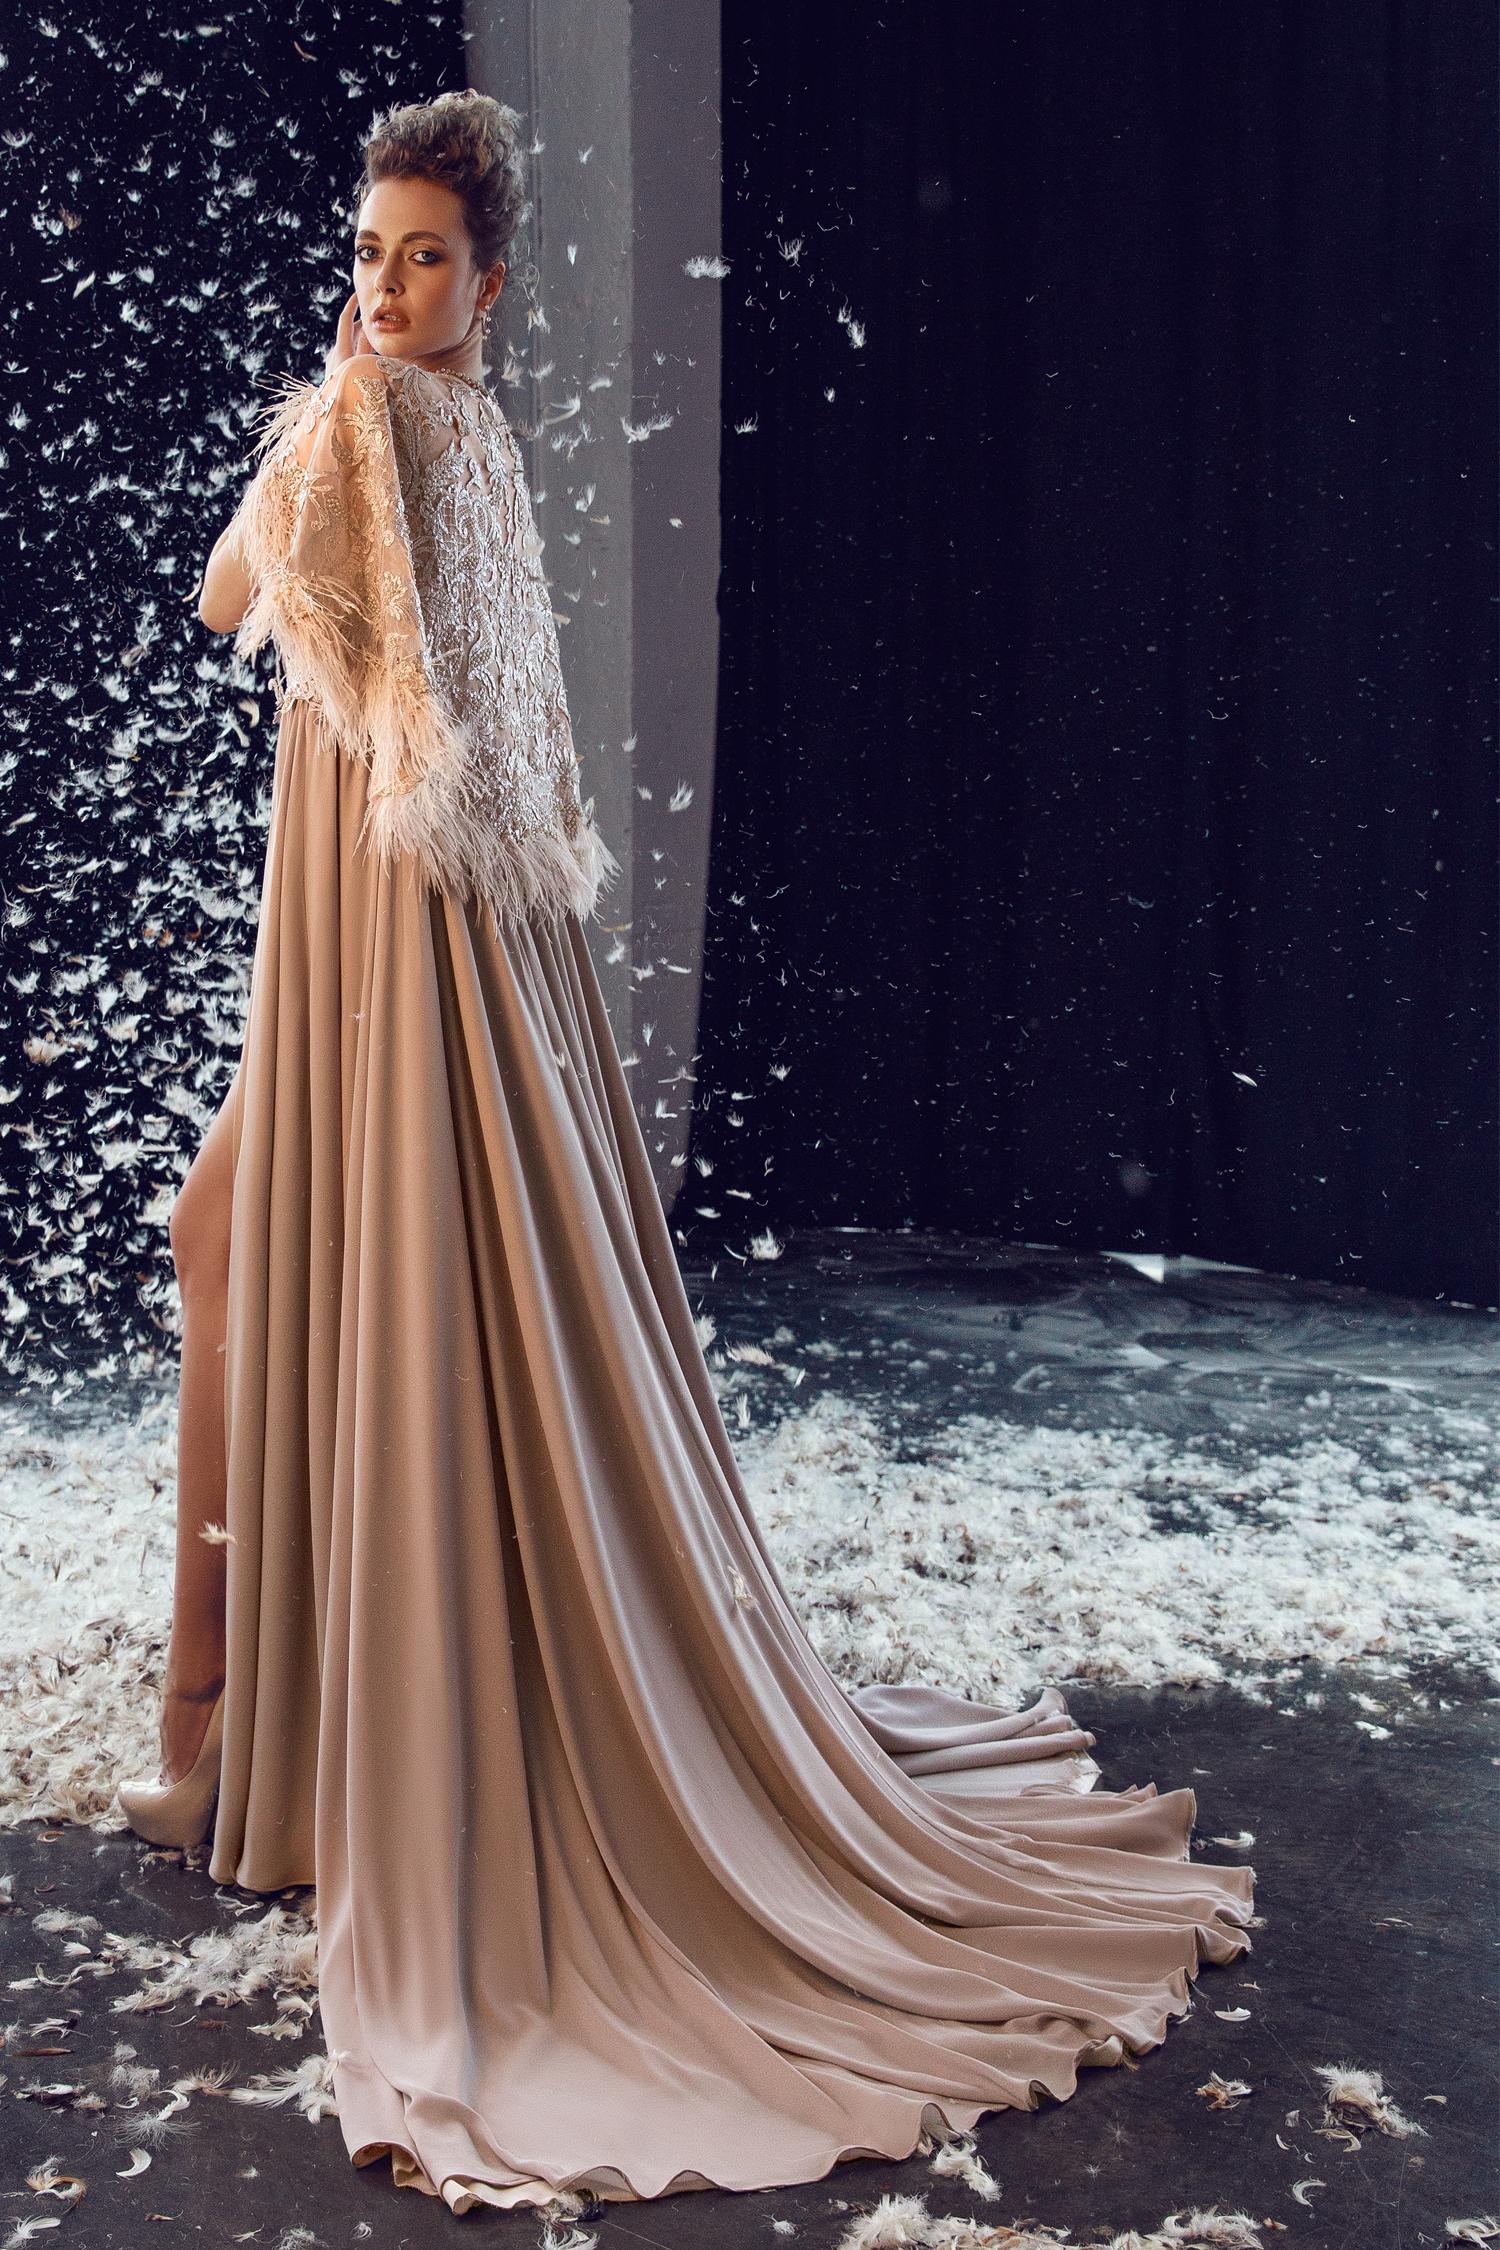 Rochie De Seara Sposa Ed18 01 Rochii Elegante De Lux